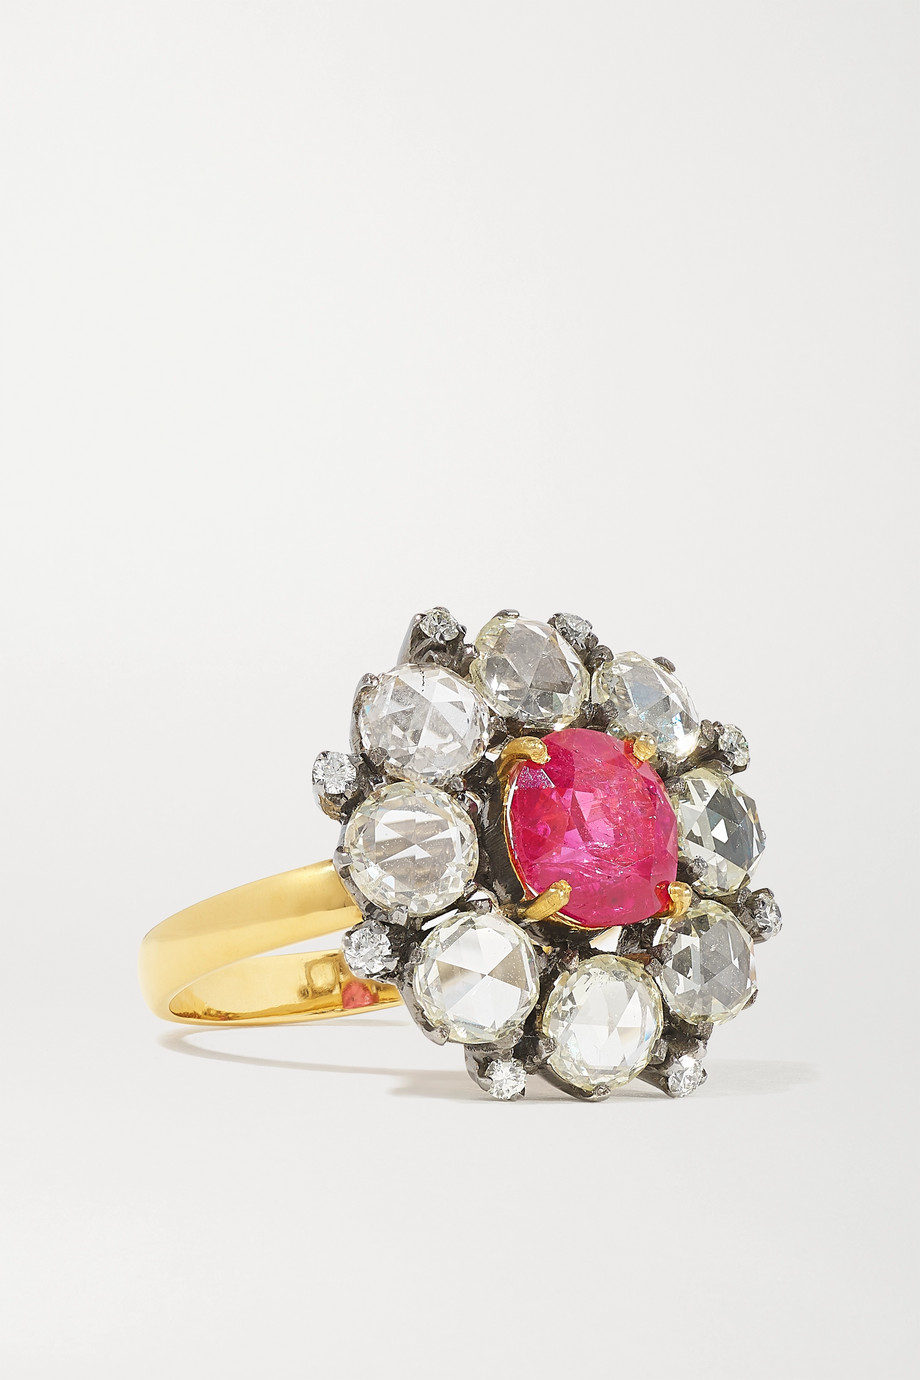 Amrapali Ring aus 18 Karat Gold mit Sterlingsilberauflage, Diamanten und Rubin